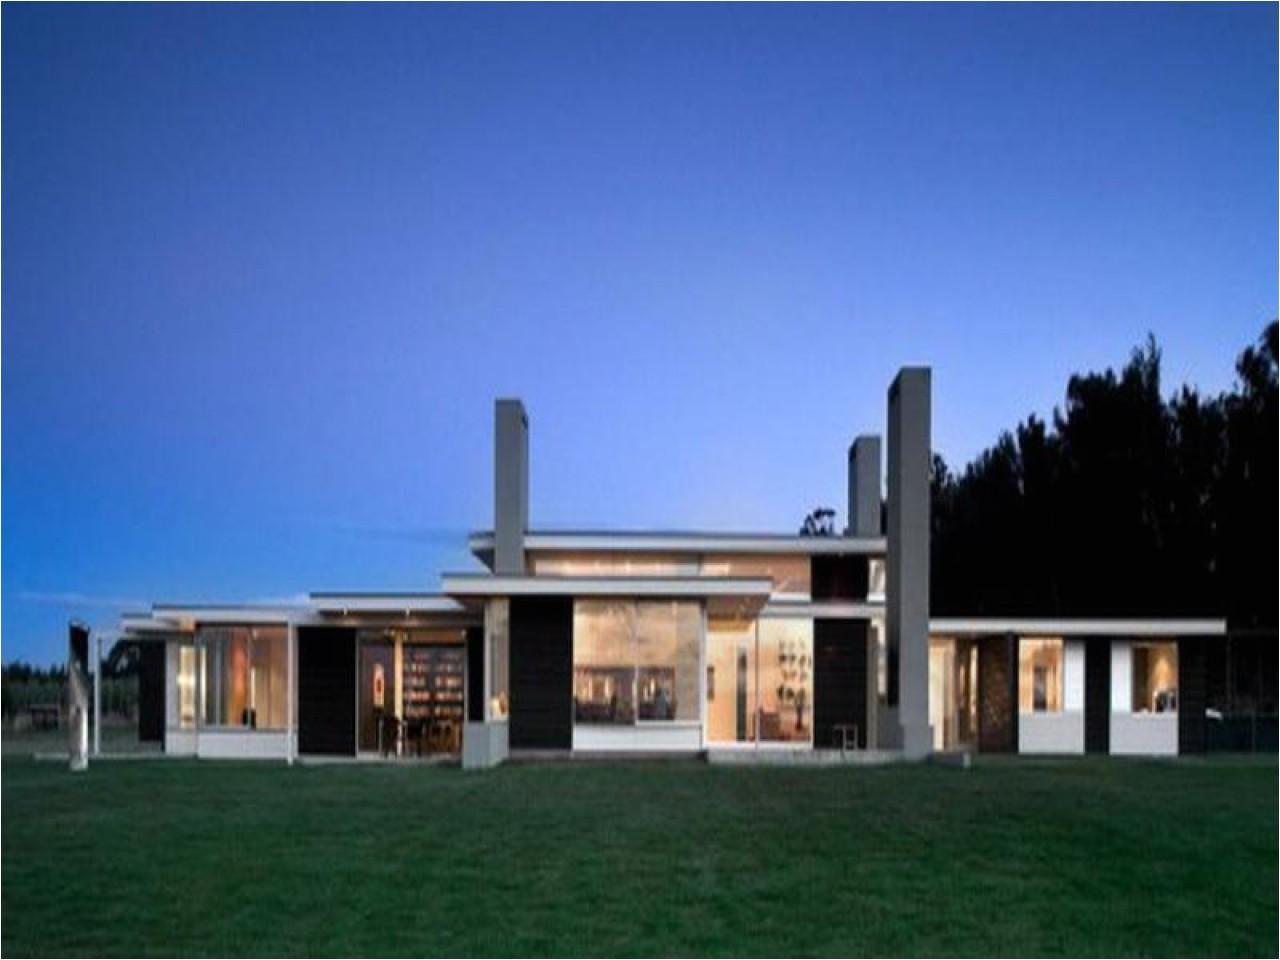 fb622eab6a2ba4e2 modern single story house plans unique single story home designs